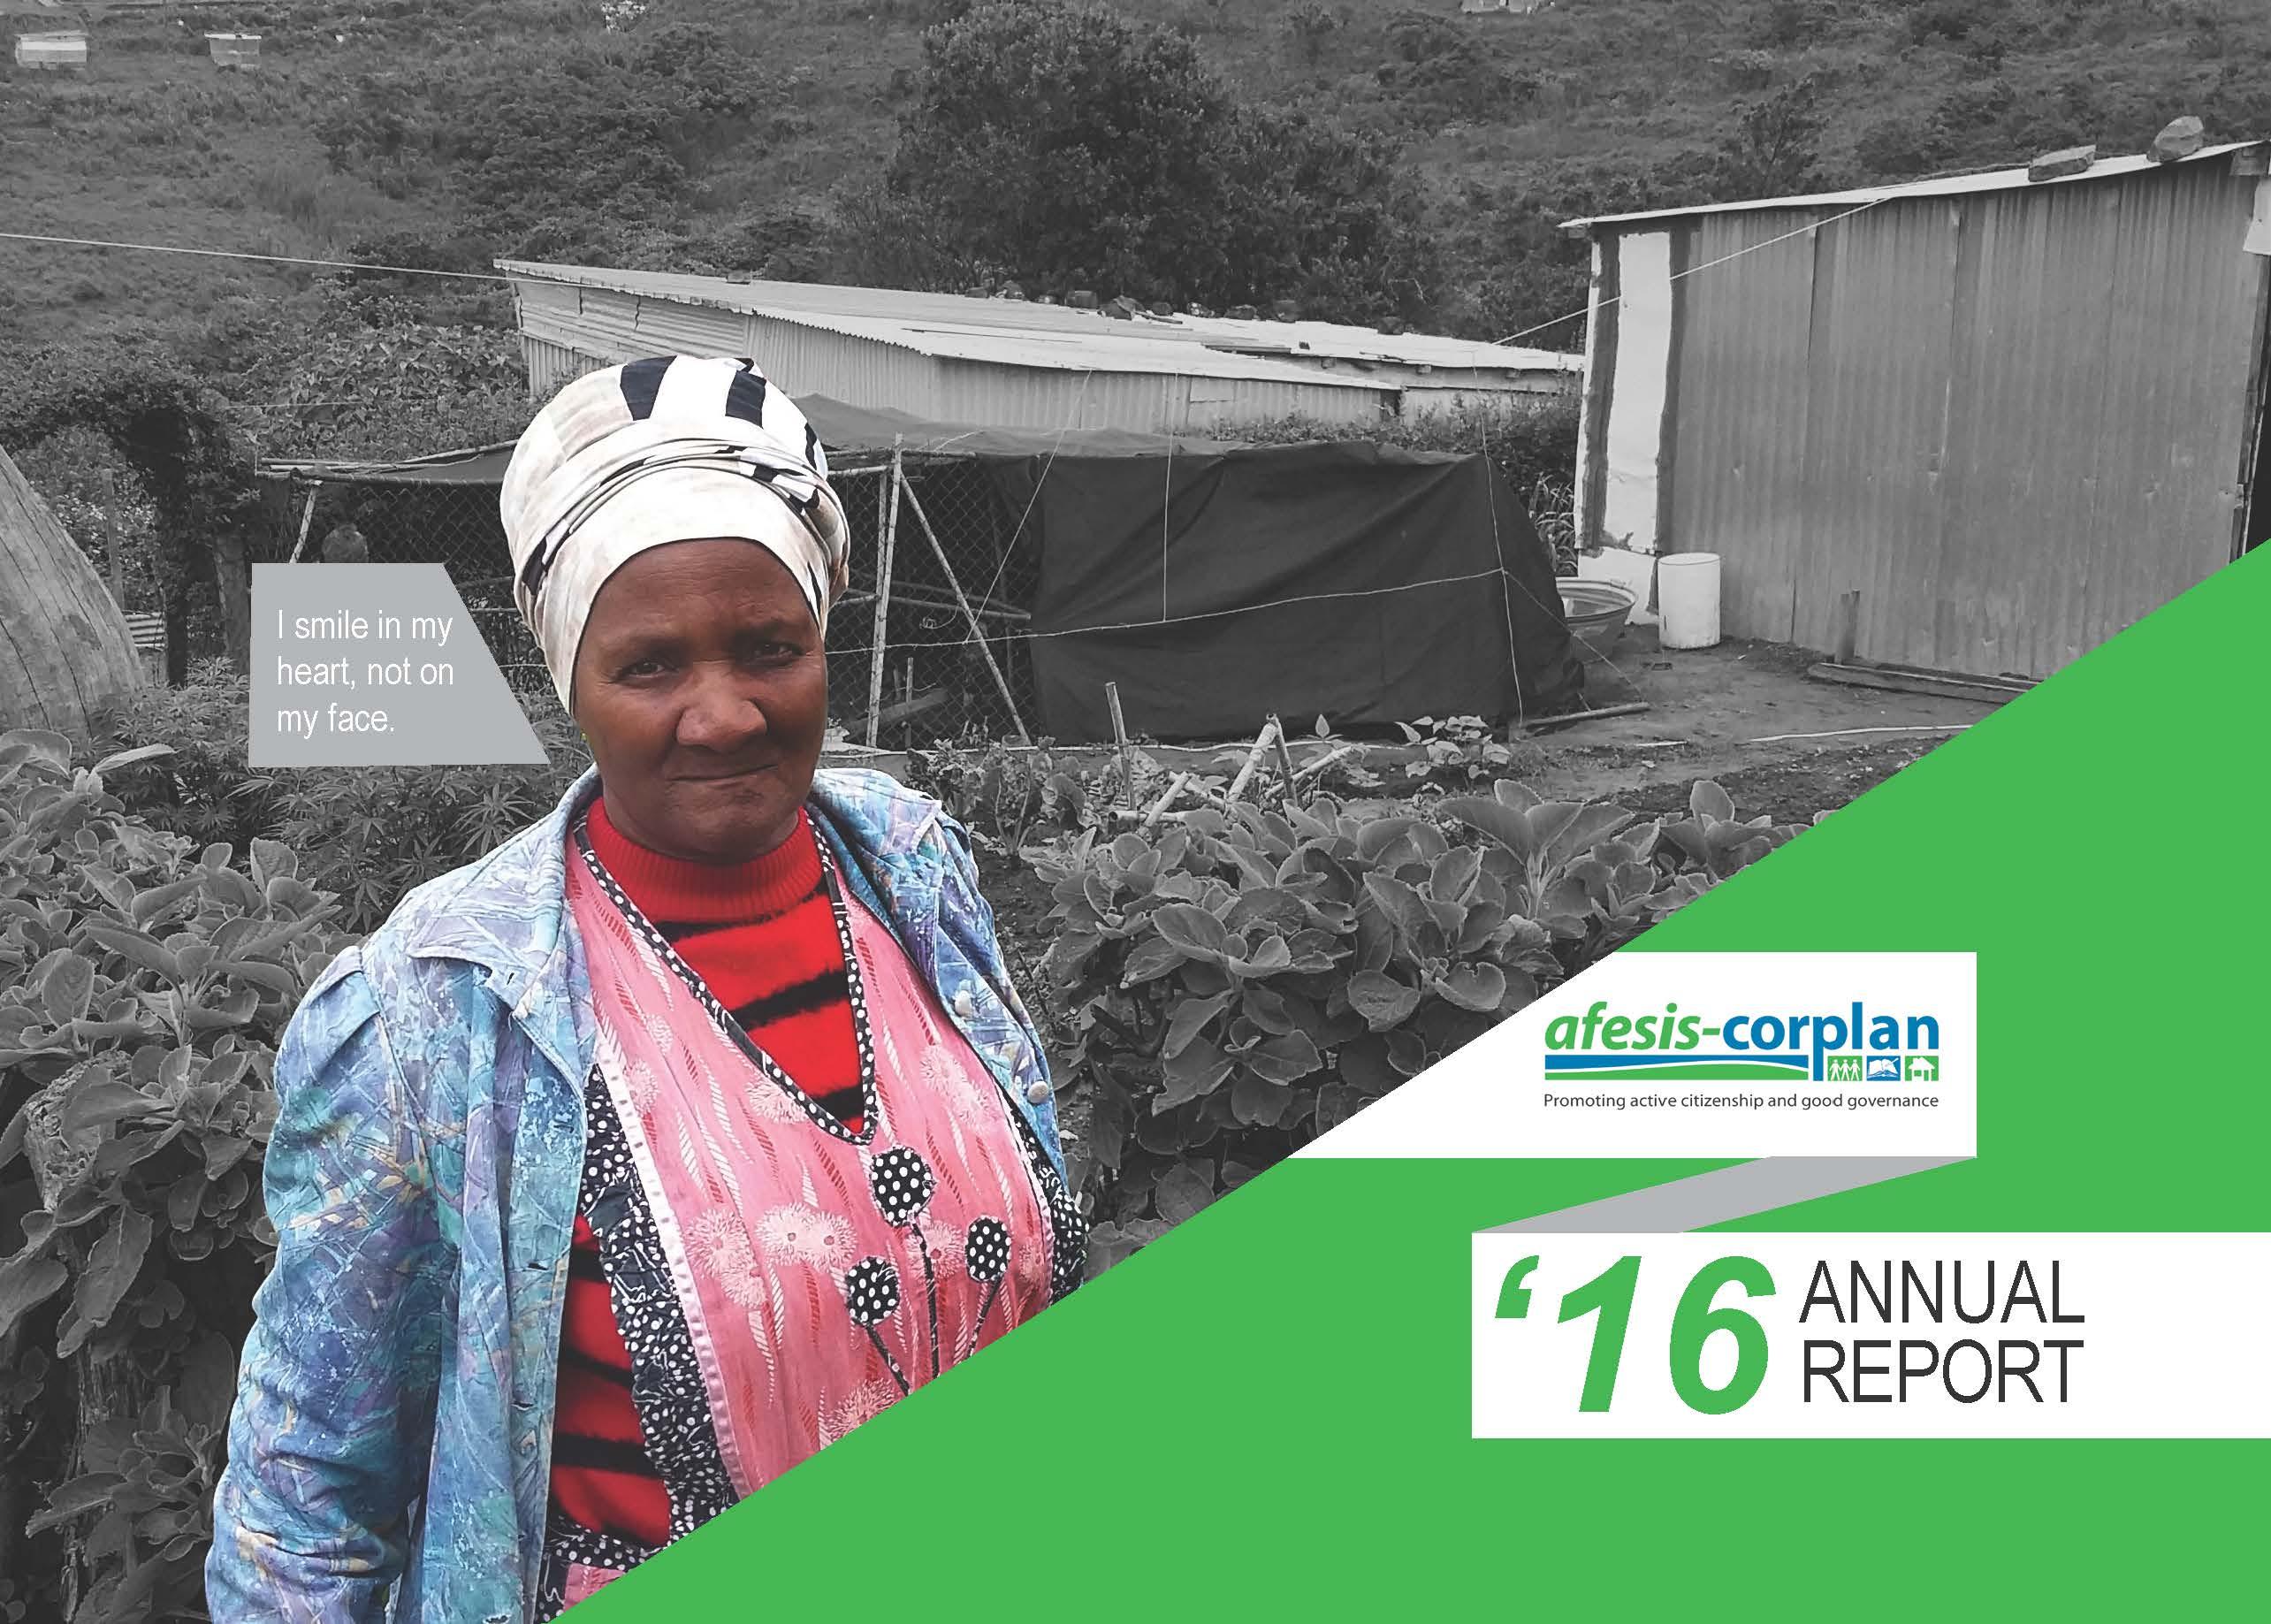 Afesis-corplan Annual Report 2016